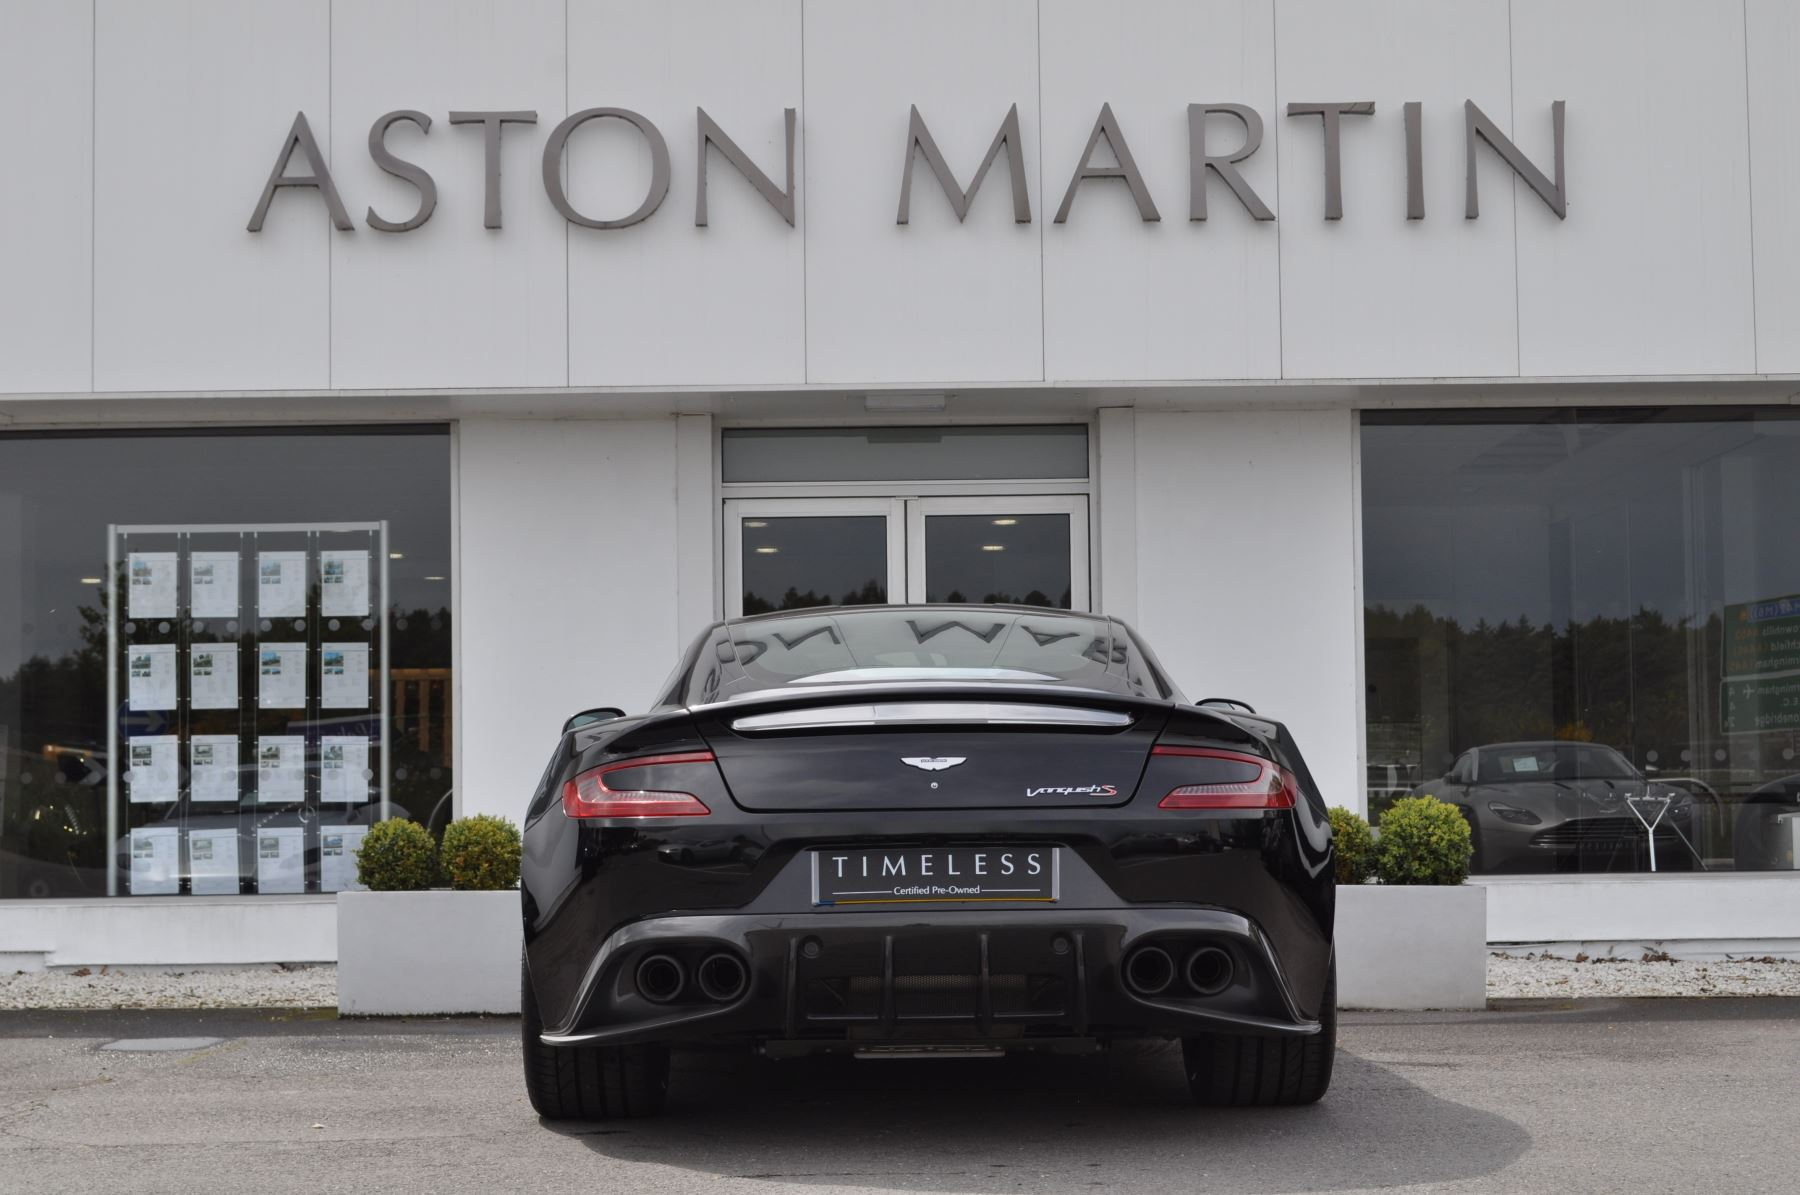 Aston Martin Vanquish S V12 [595] S 2+2 2dr Touchtronic image 6